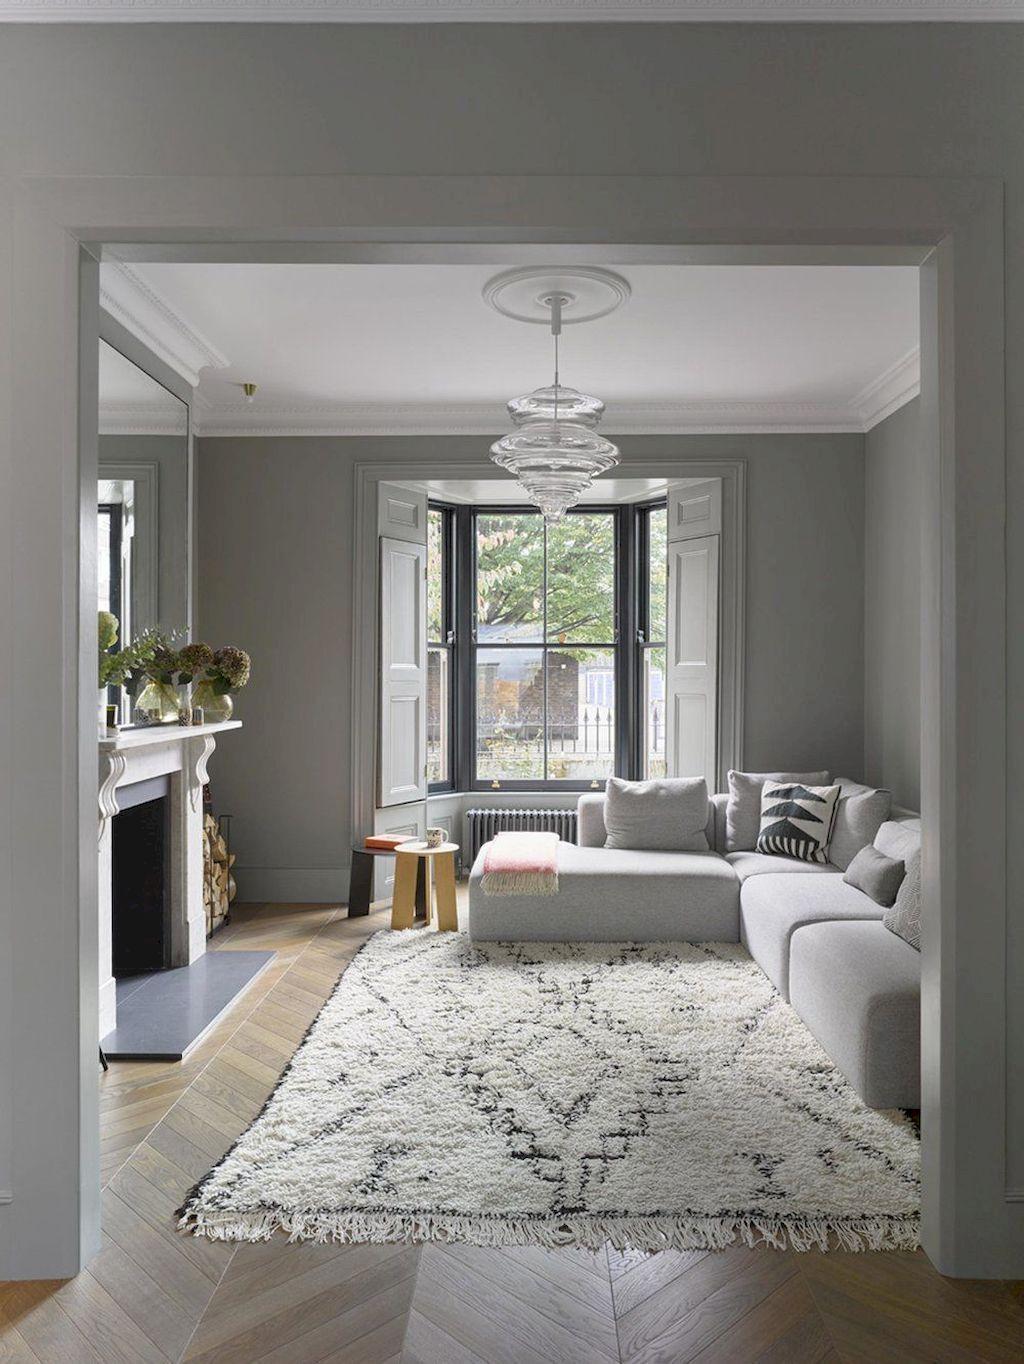 Inspiring Small Living Room Decor Ideas 15